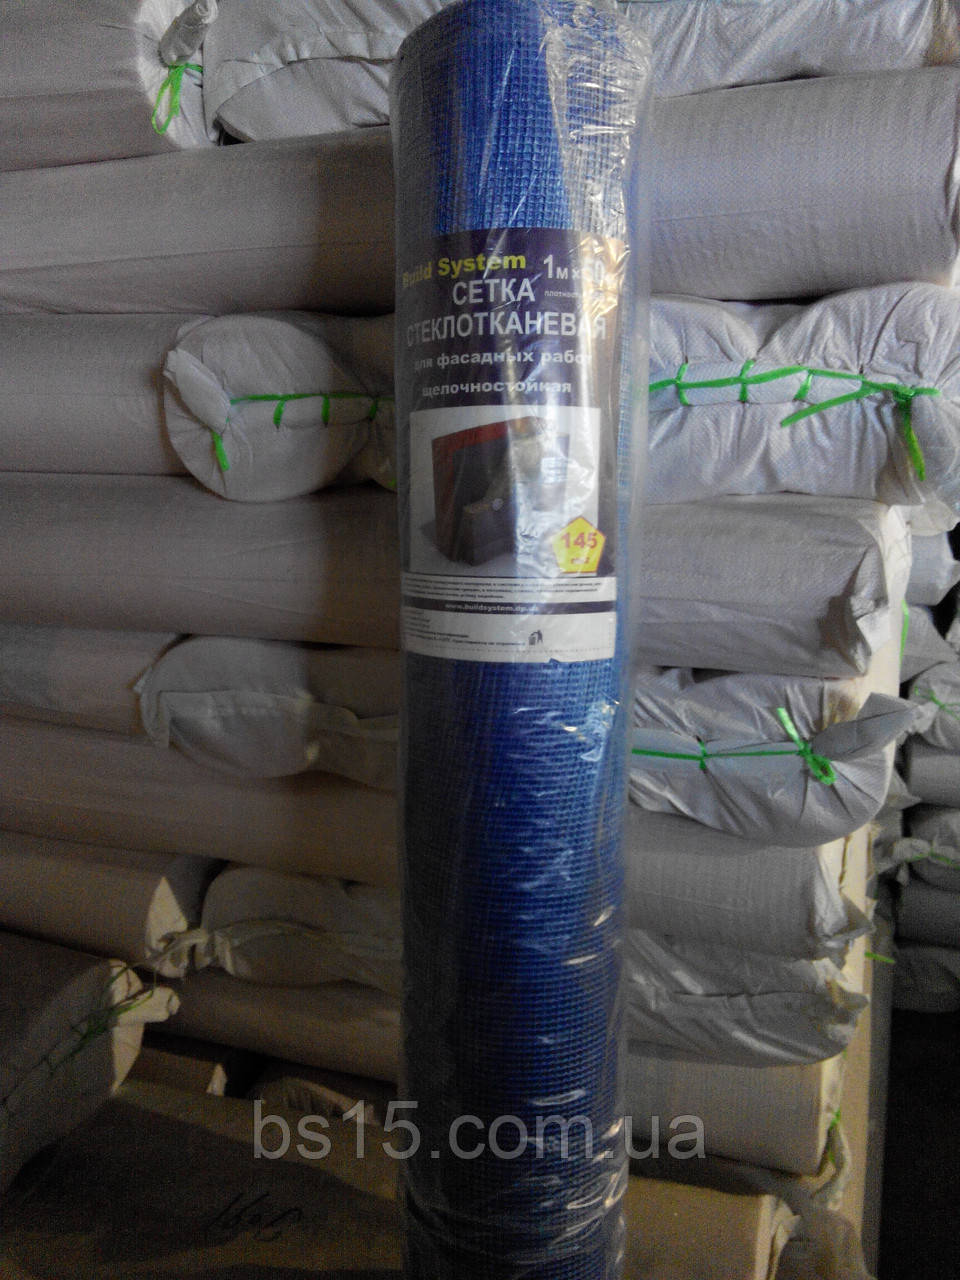 Сетка фасадная (5*5мм), 1х50м, 145 г/м2, синяя доставка по Украине, фото 1